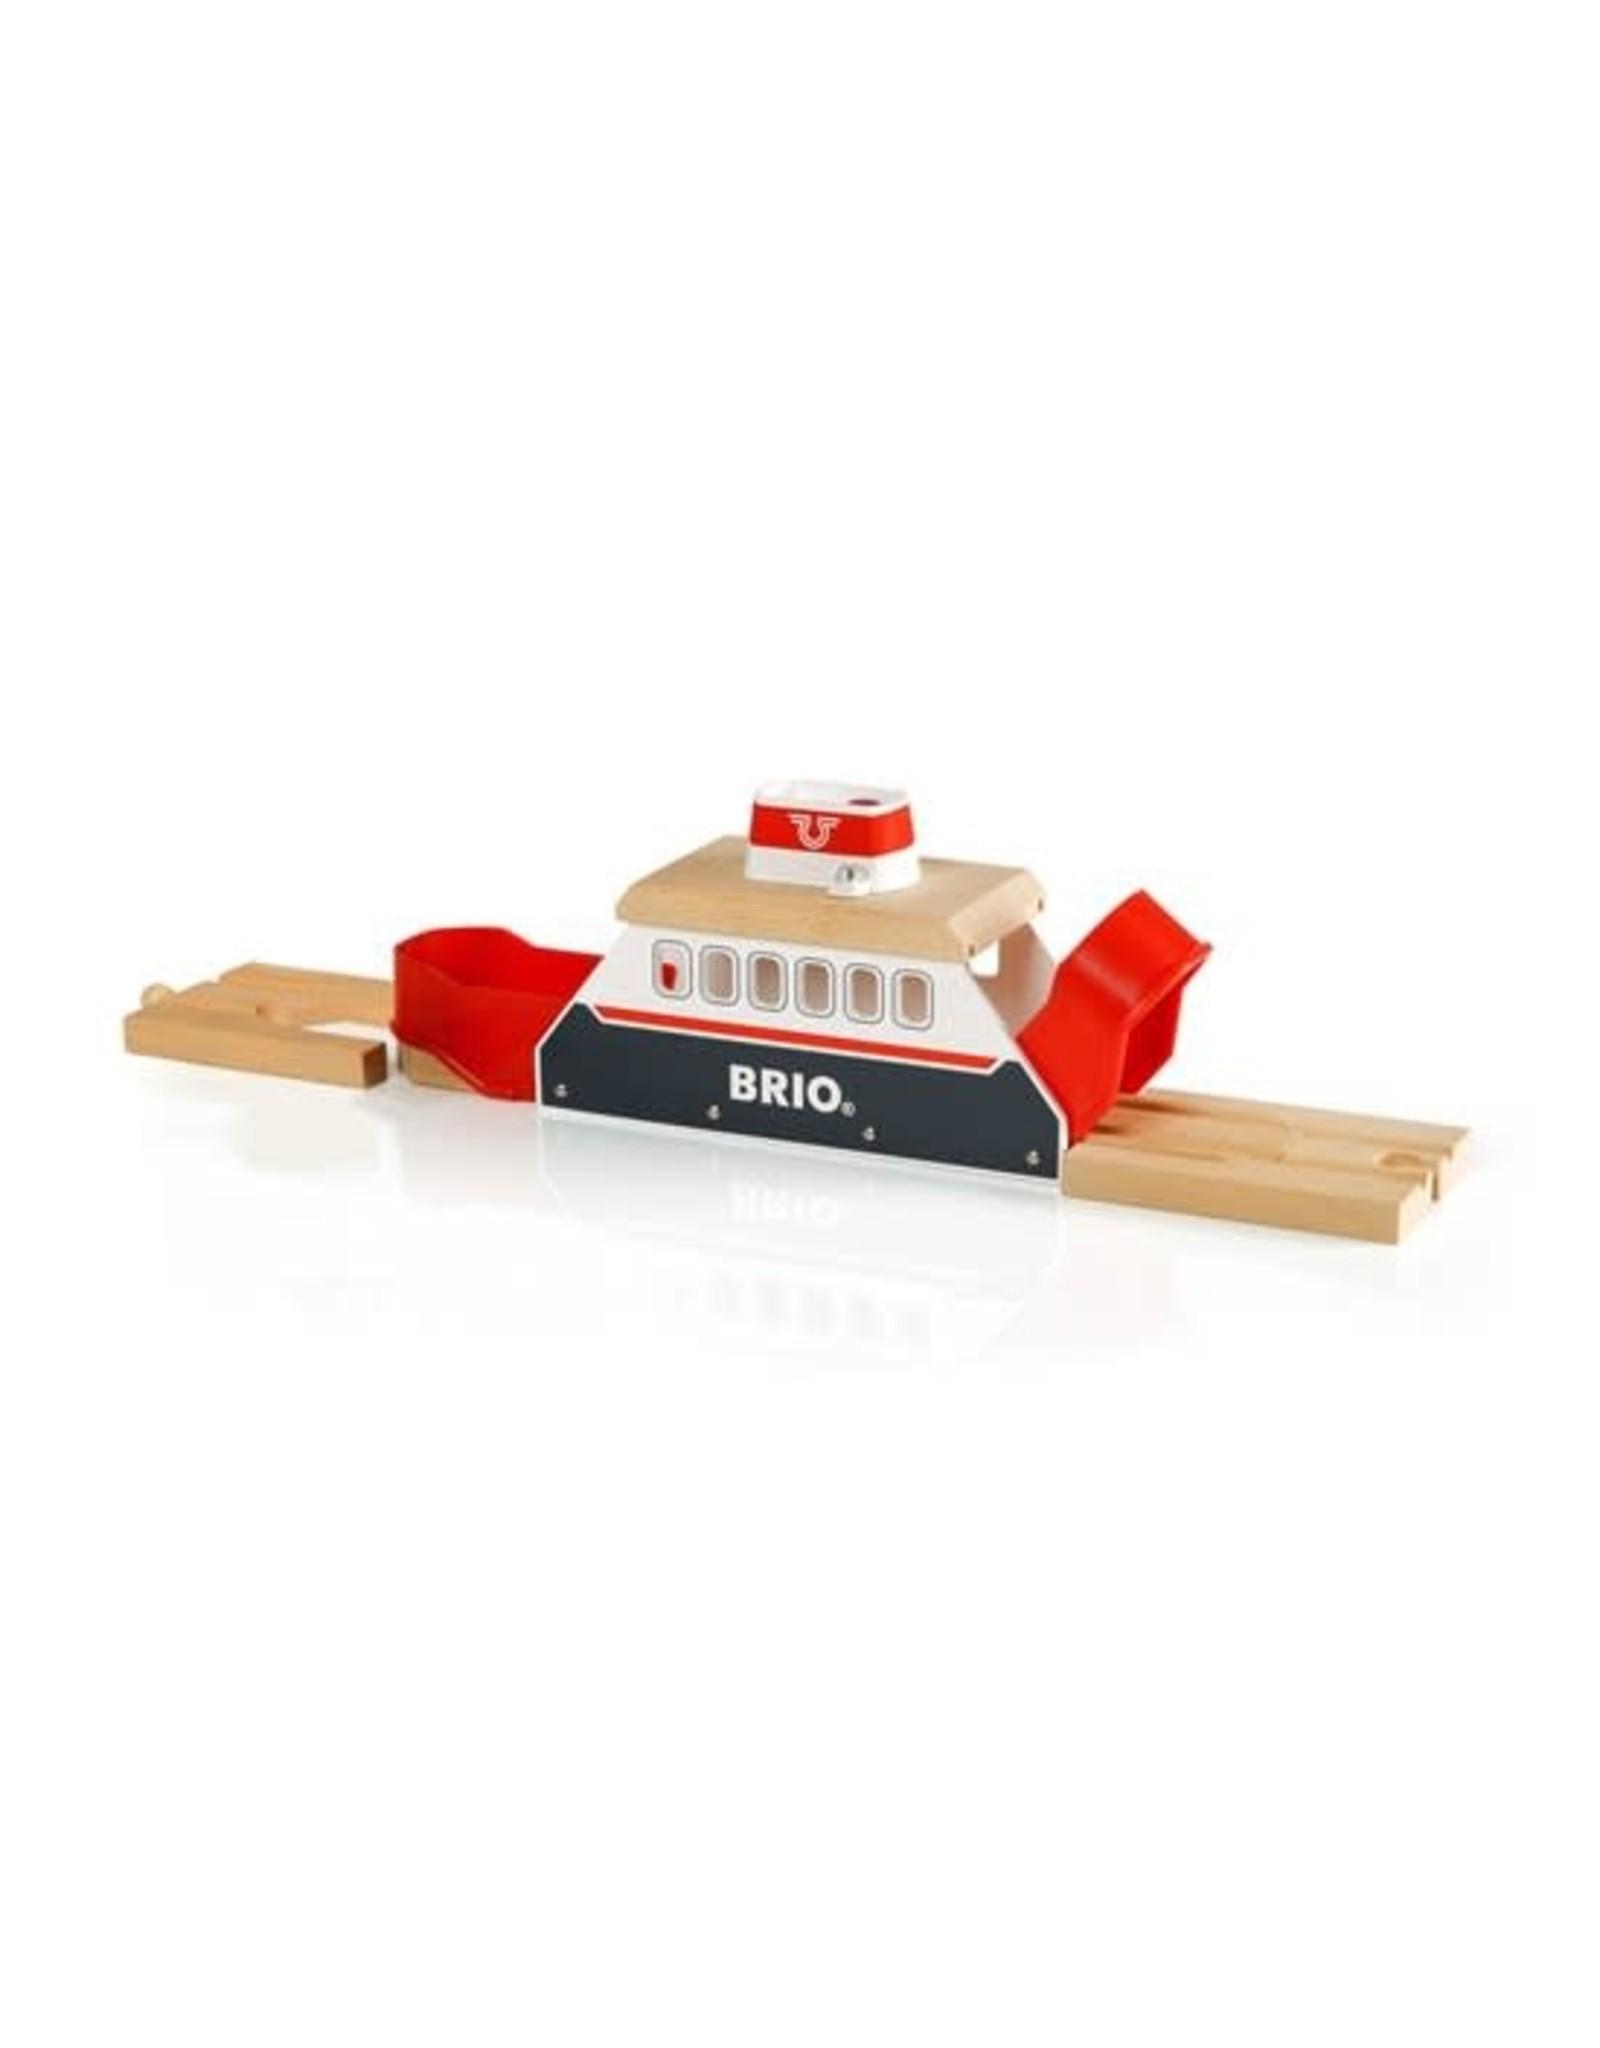 Brio Ferry Ship for Railway